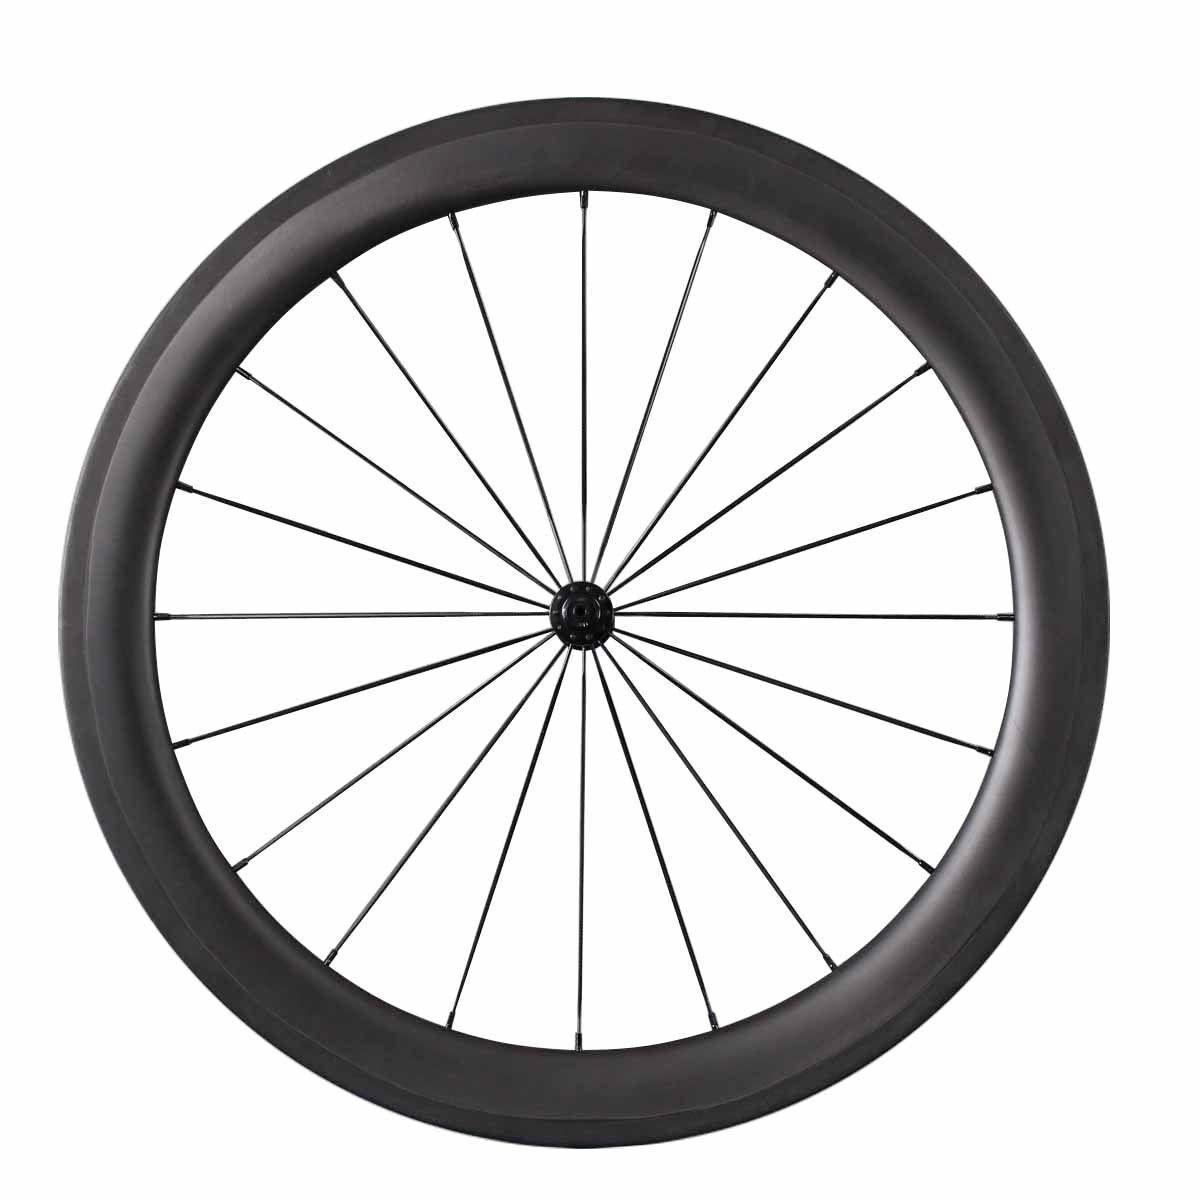 Carbon Road Bike Bicycle Racing  Wheels 60mm+88mm Tubular Carbon Wheels  no tax